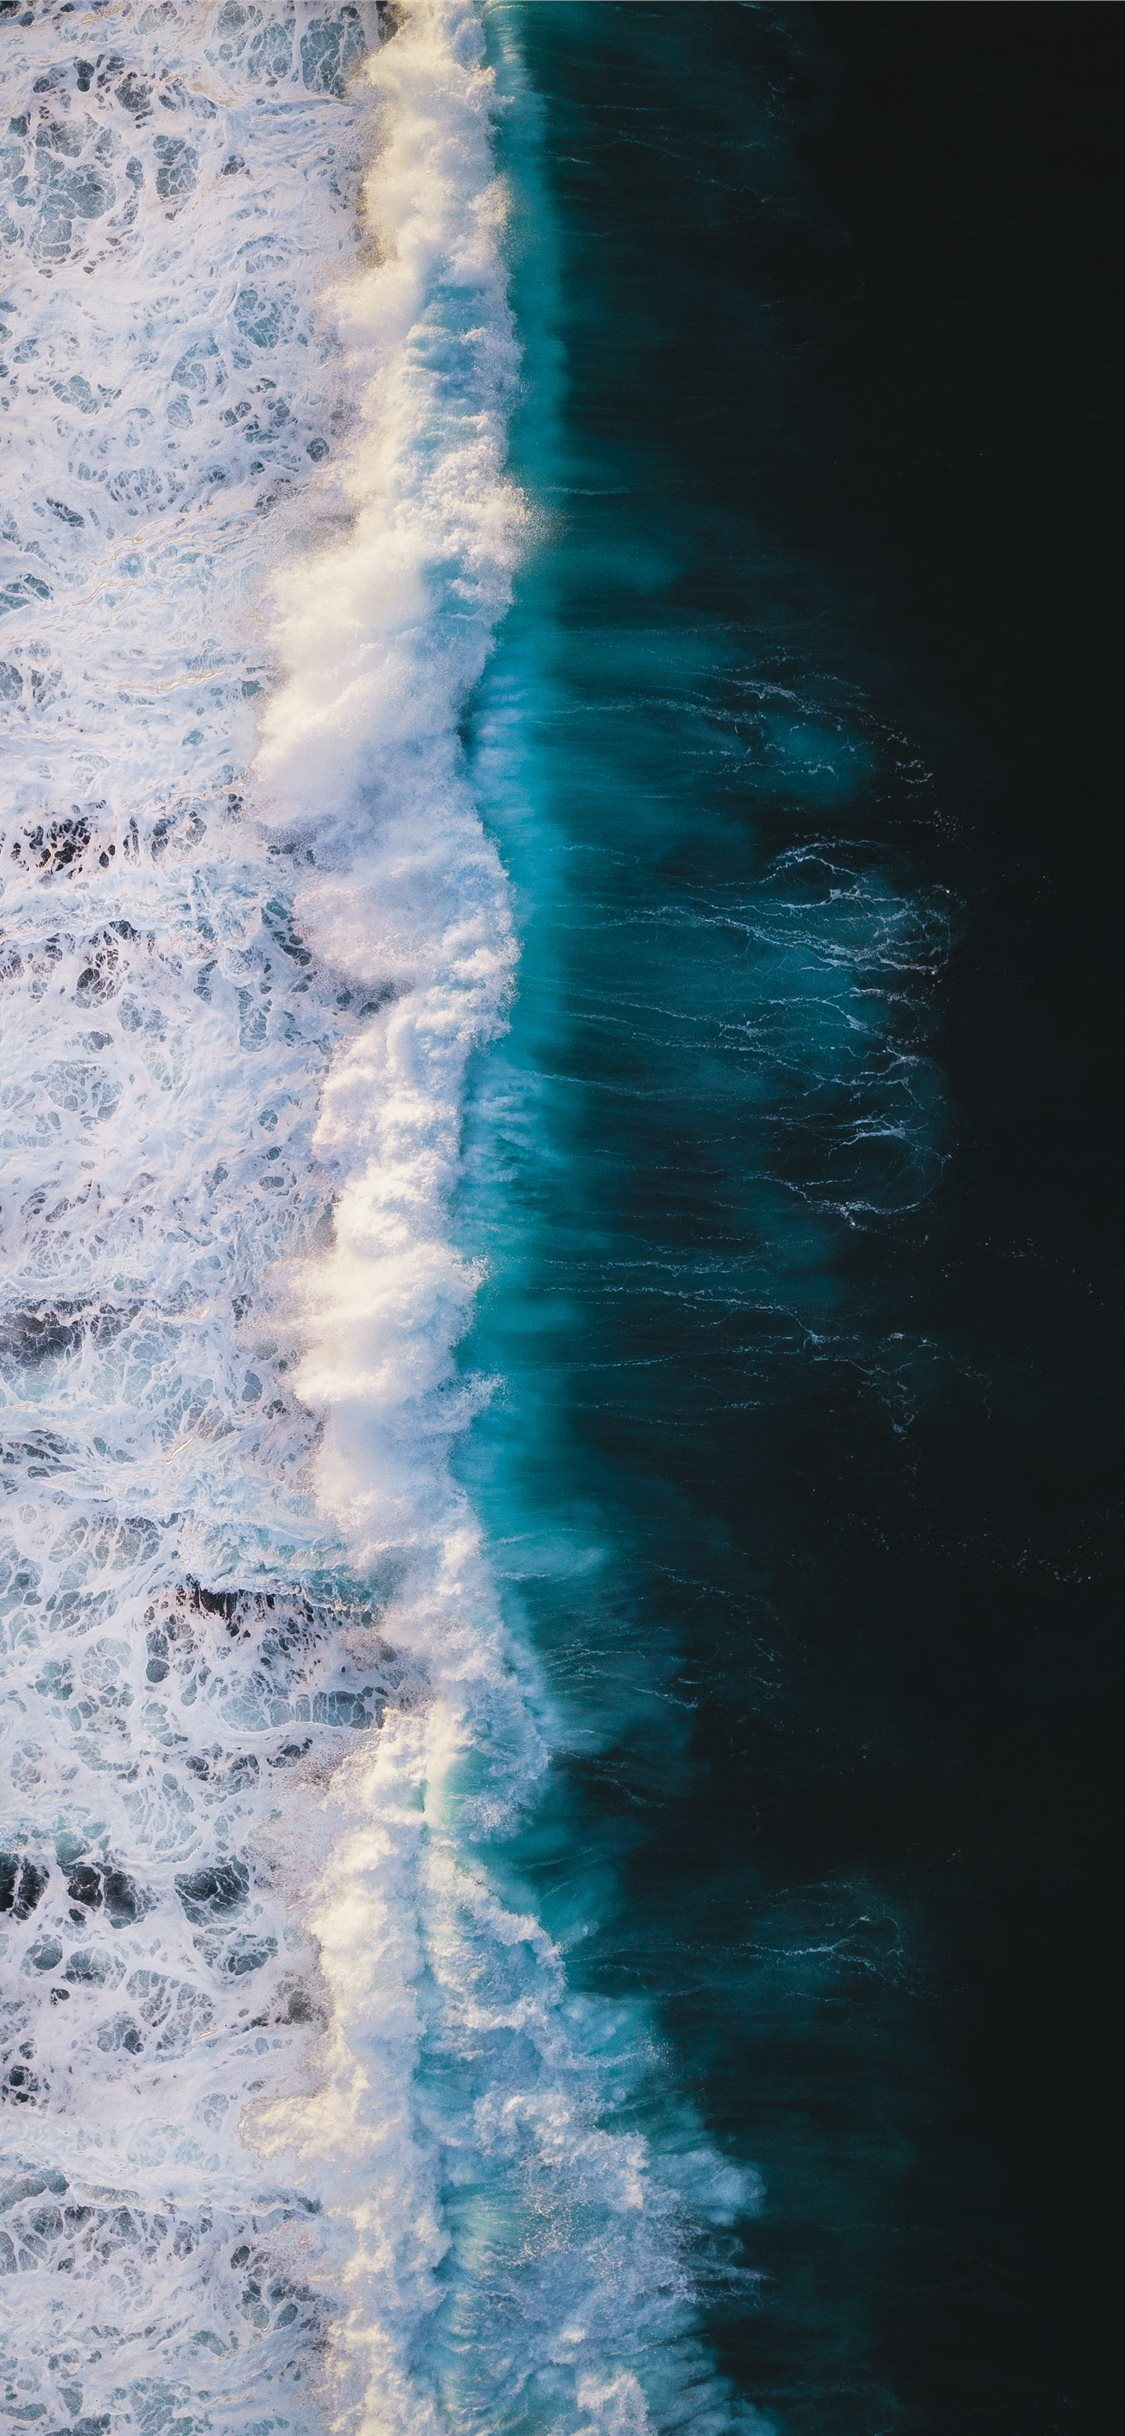 Ocean Wave Iphone X Wallpapers Free Download